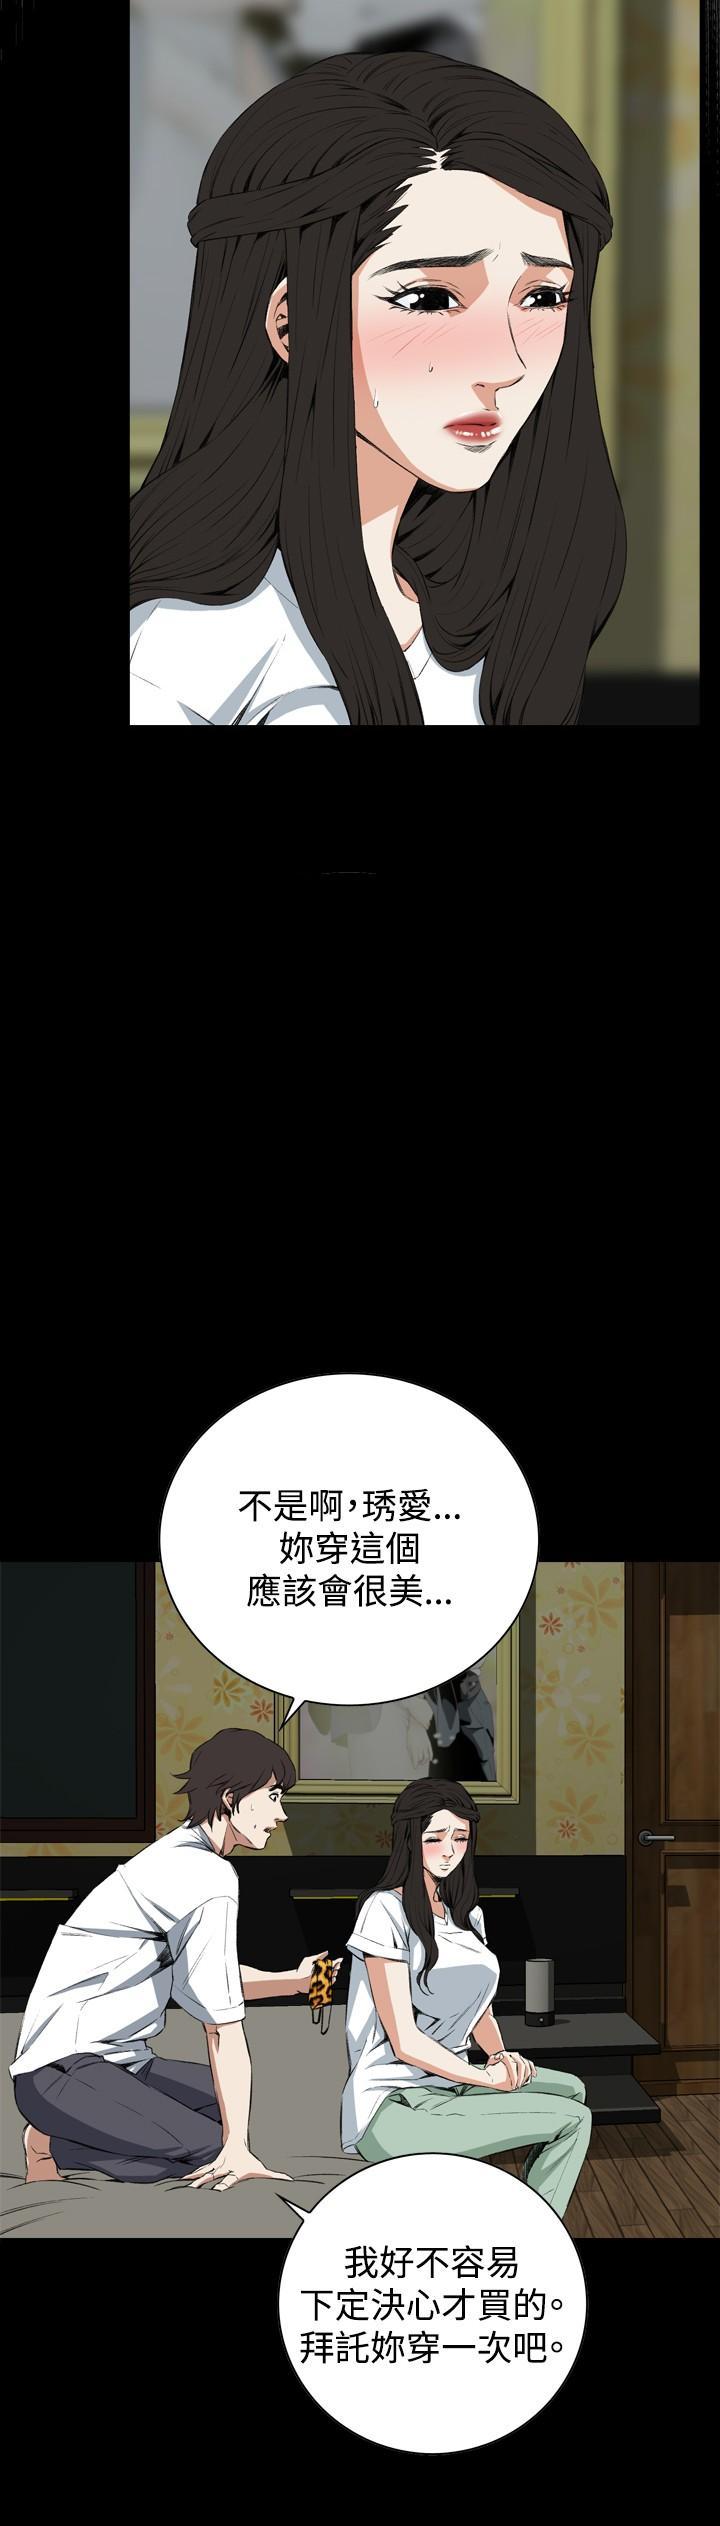 Take a Peek 偷窥 Ch.39~60 [Chinese]中文 423